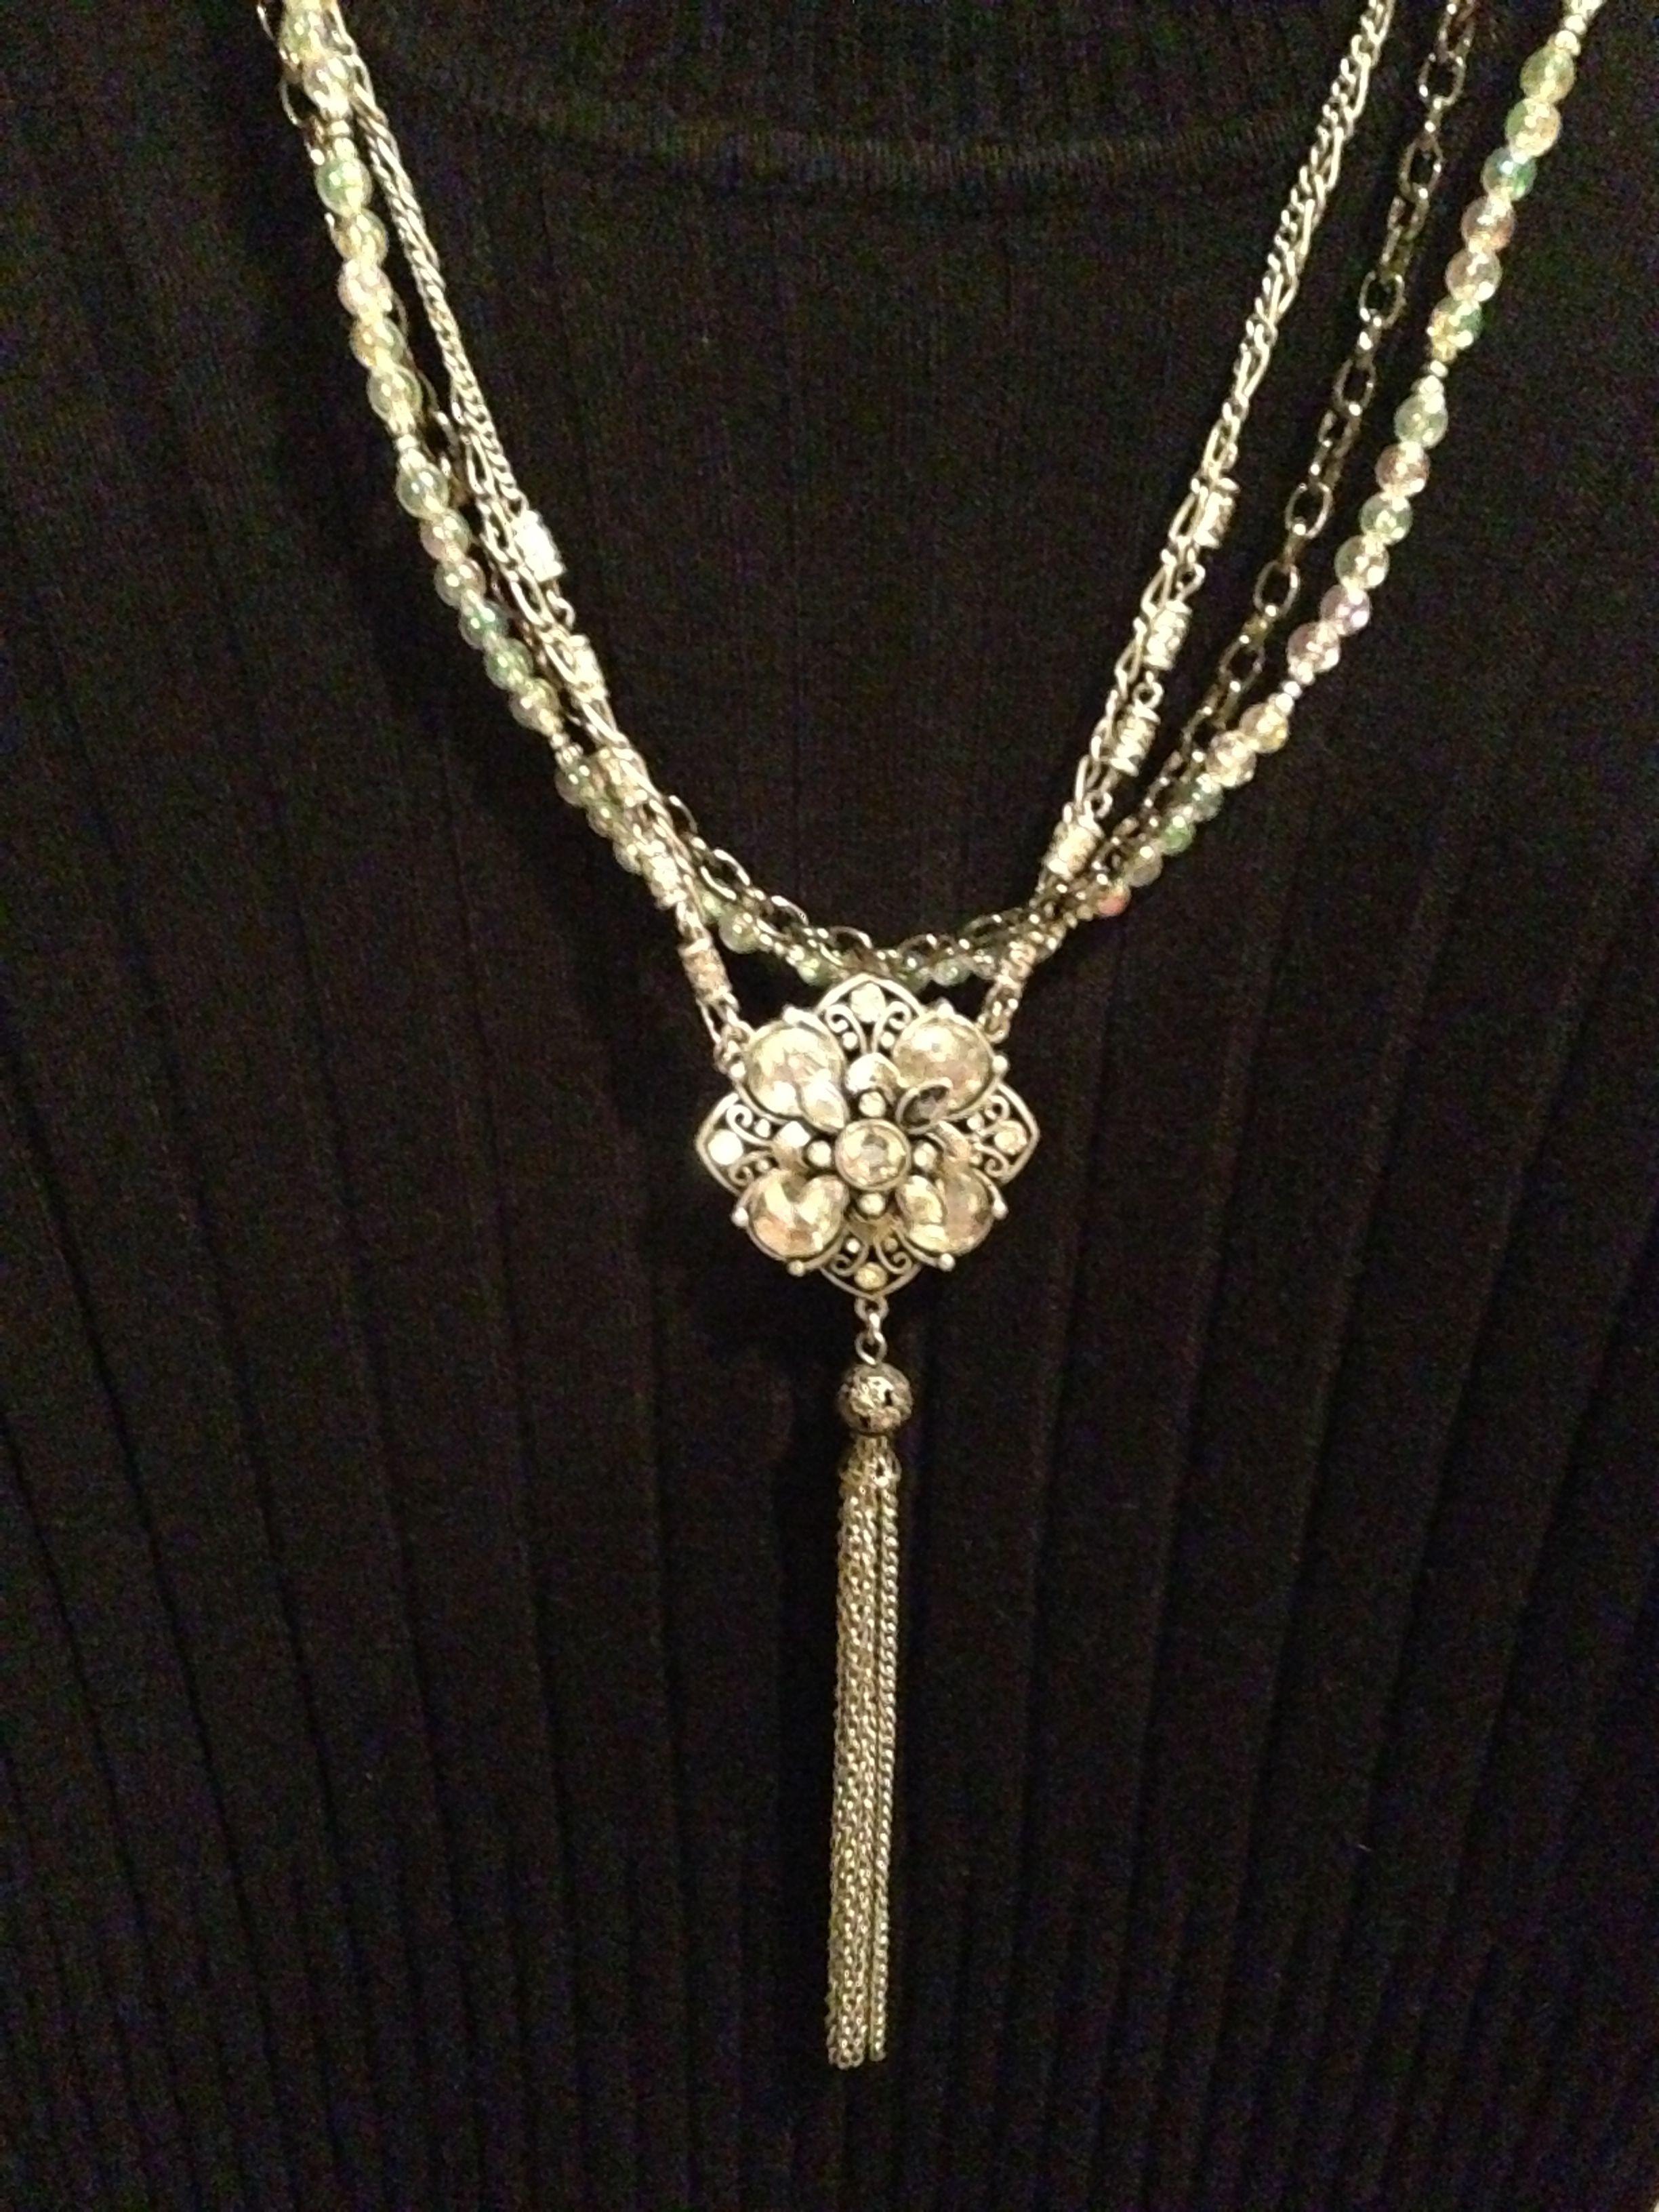 Pendant necklace project.